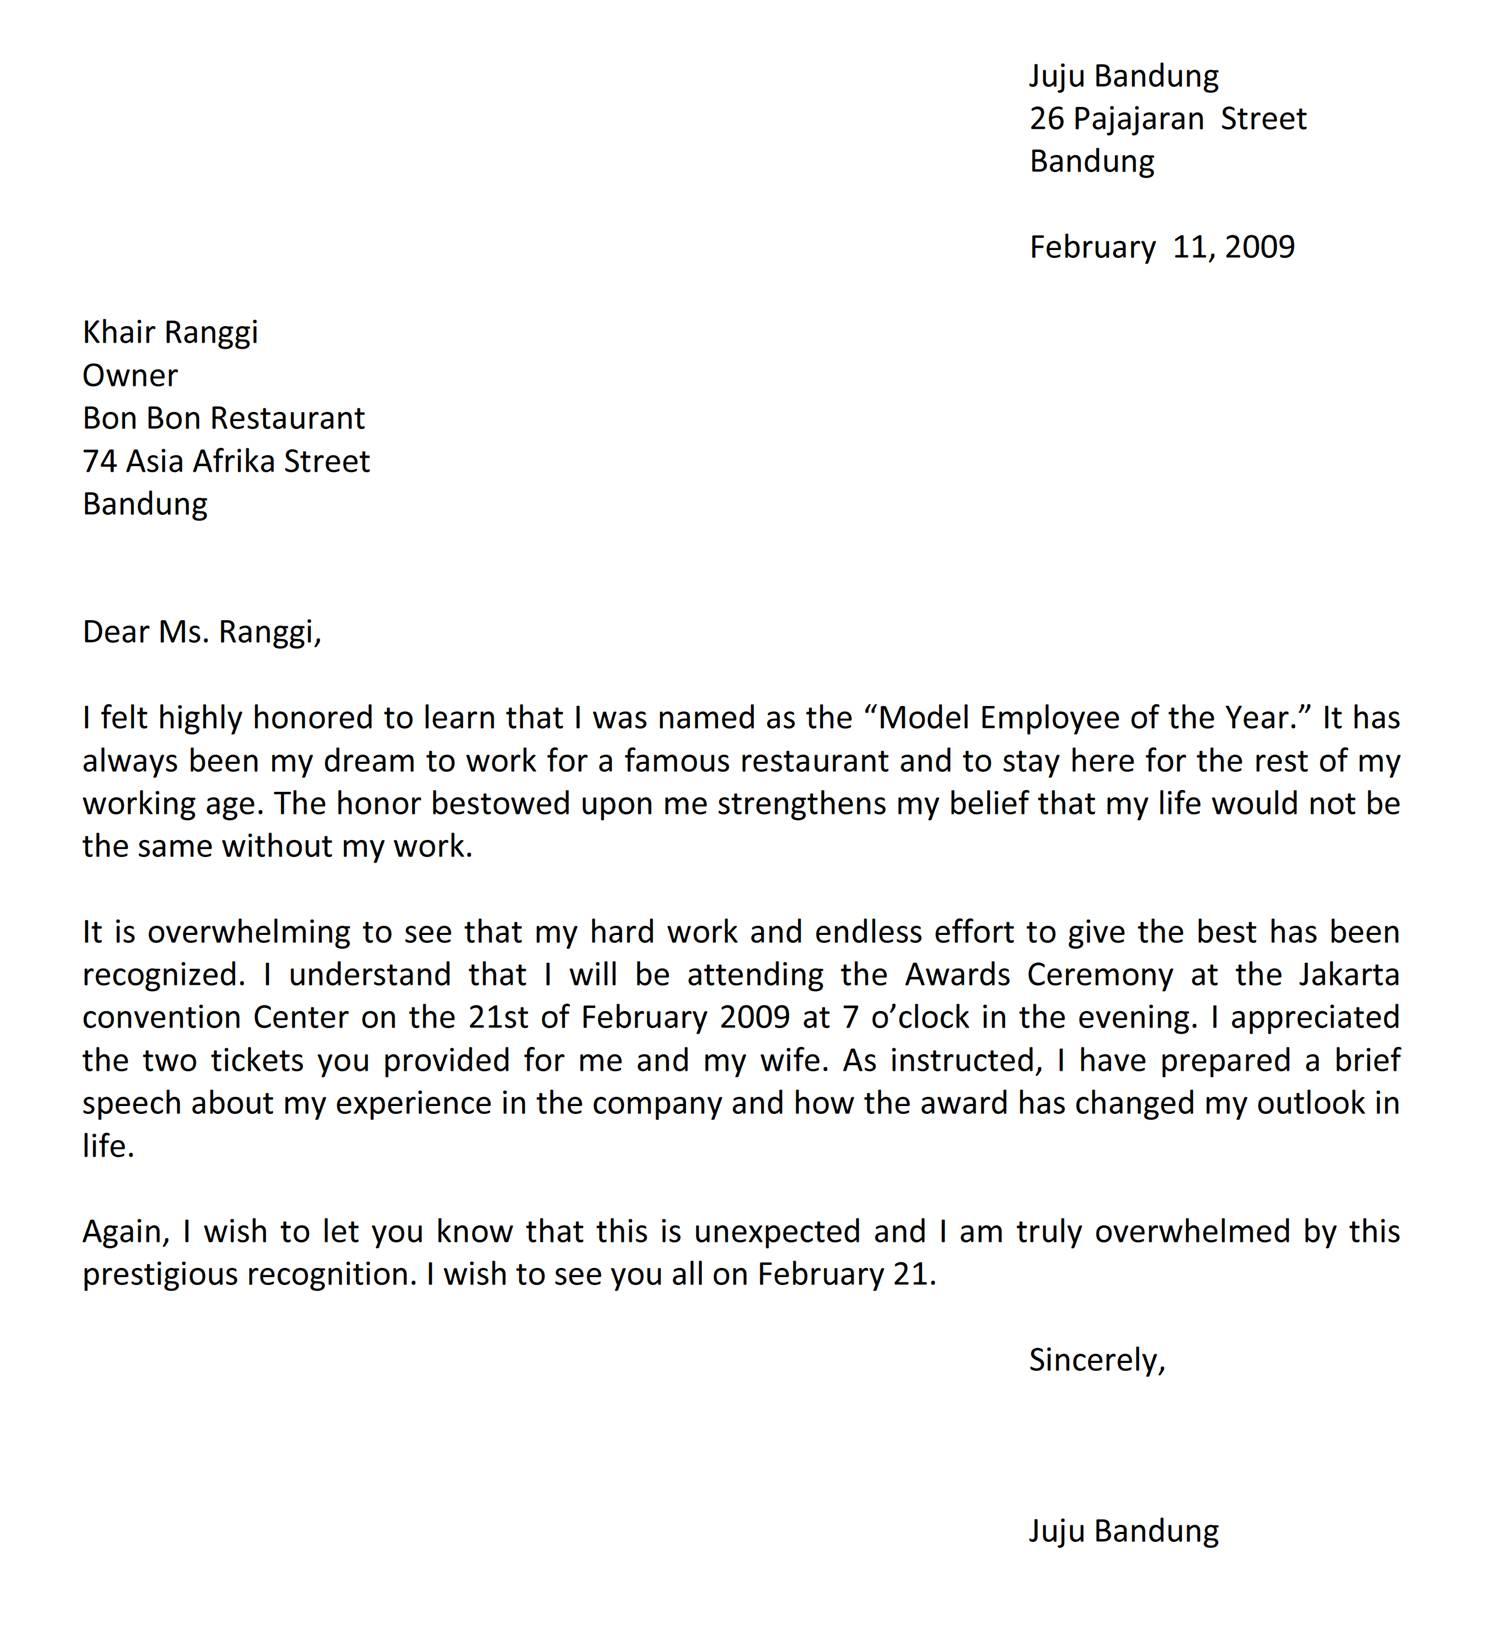 Surat Menerima Penghargaan Bahasa Inggris Jujubandung